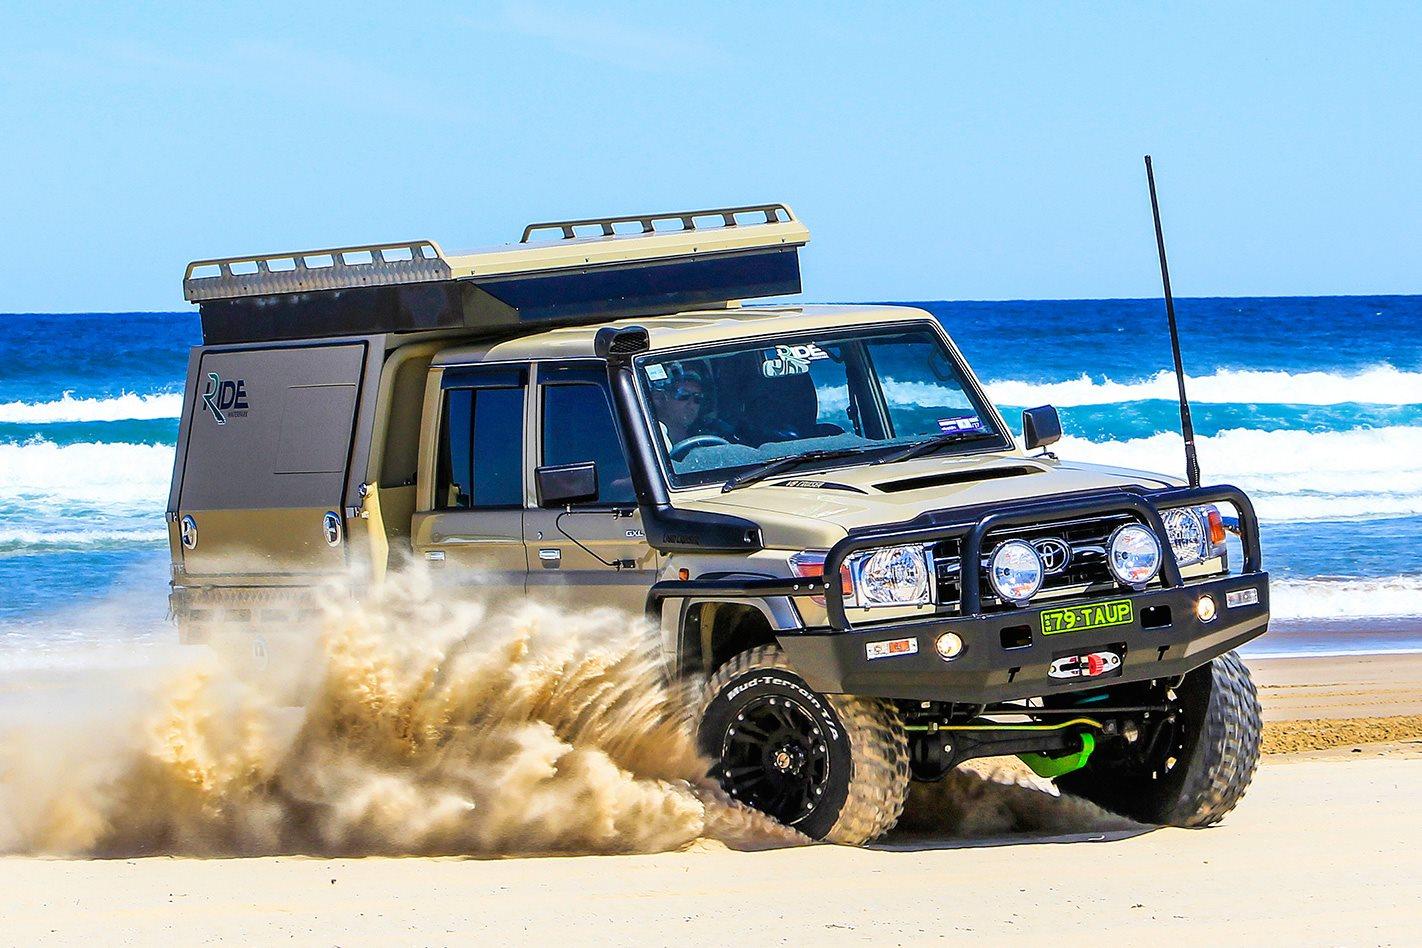 Toyota Of Everett >> Custom Toyota LandCruiser 79: Video review | 4X4 Australia